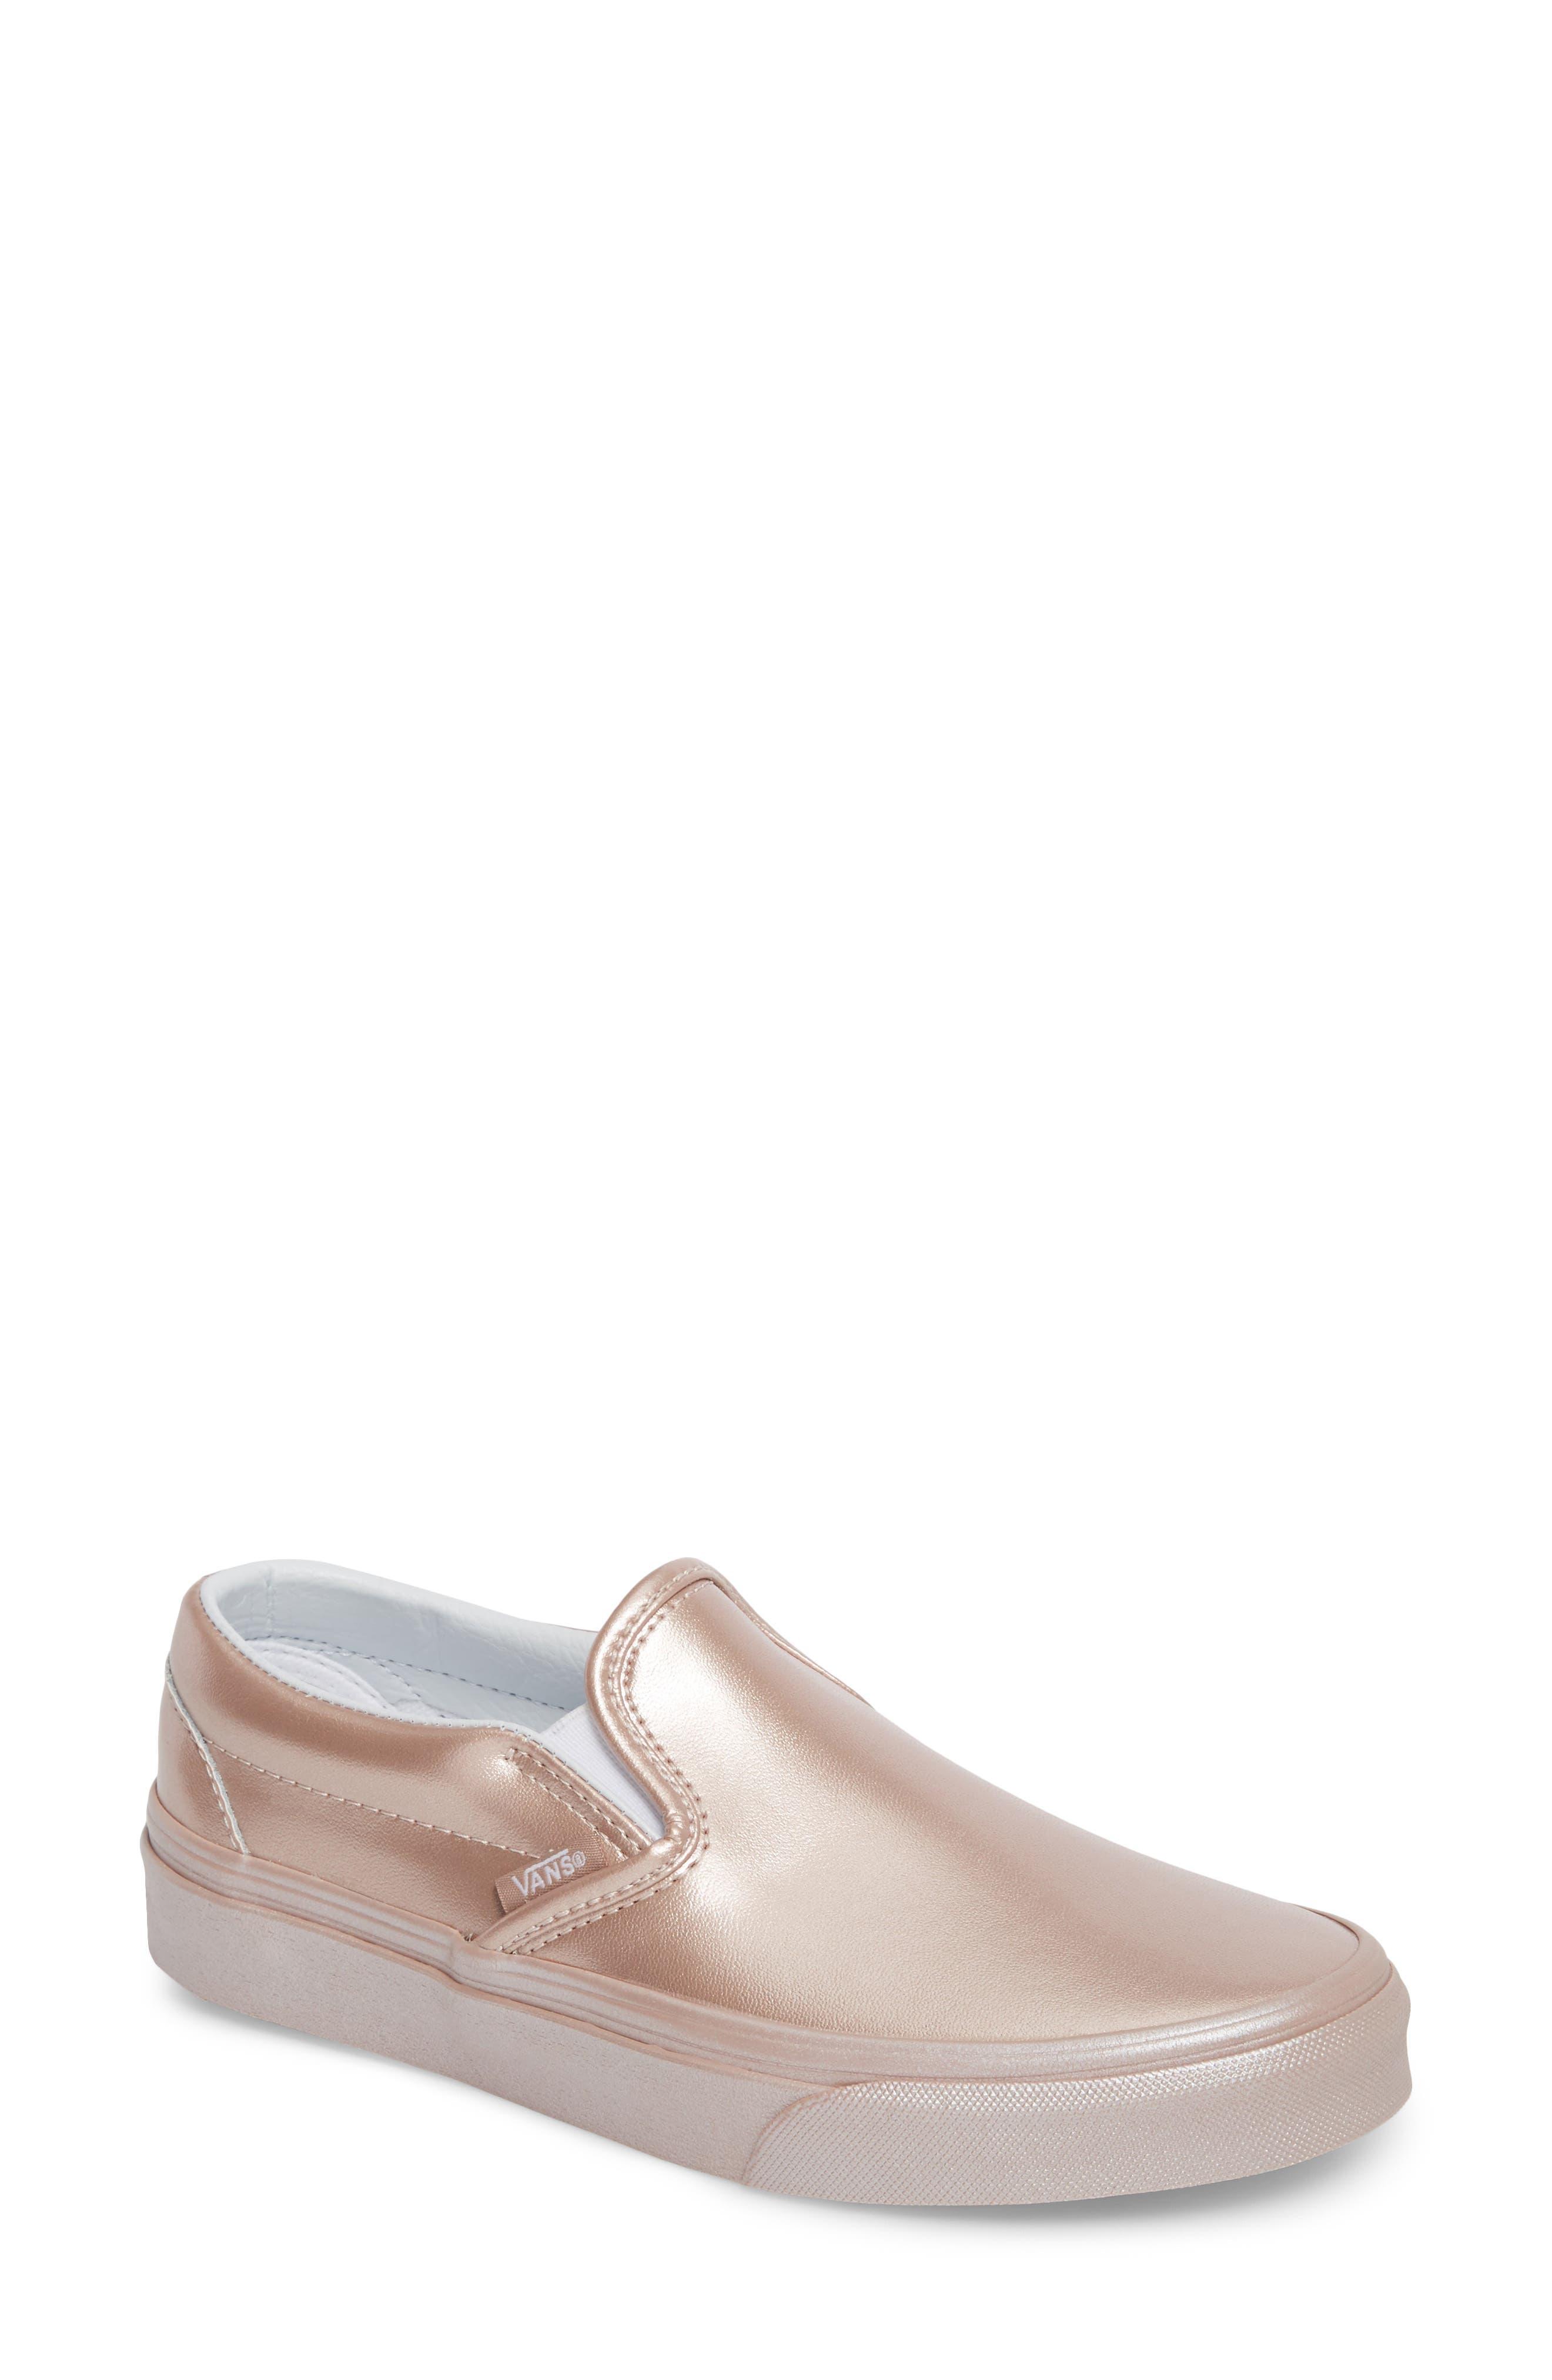 ,                             Classic Slip-On Sneaker,                             Main thumbnail 195, color,                             659